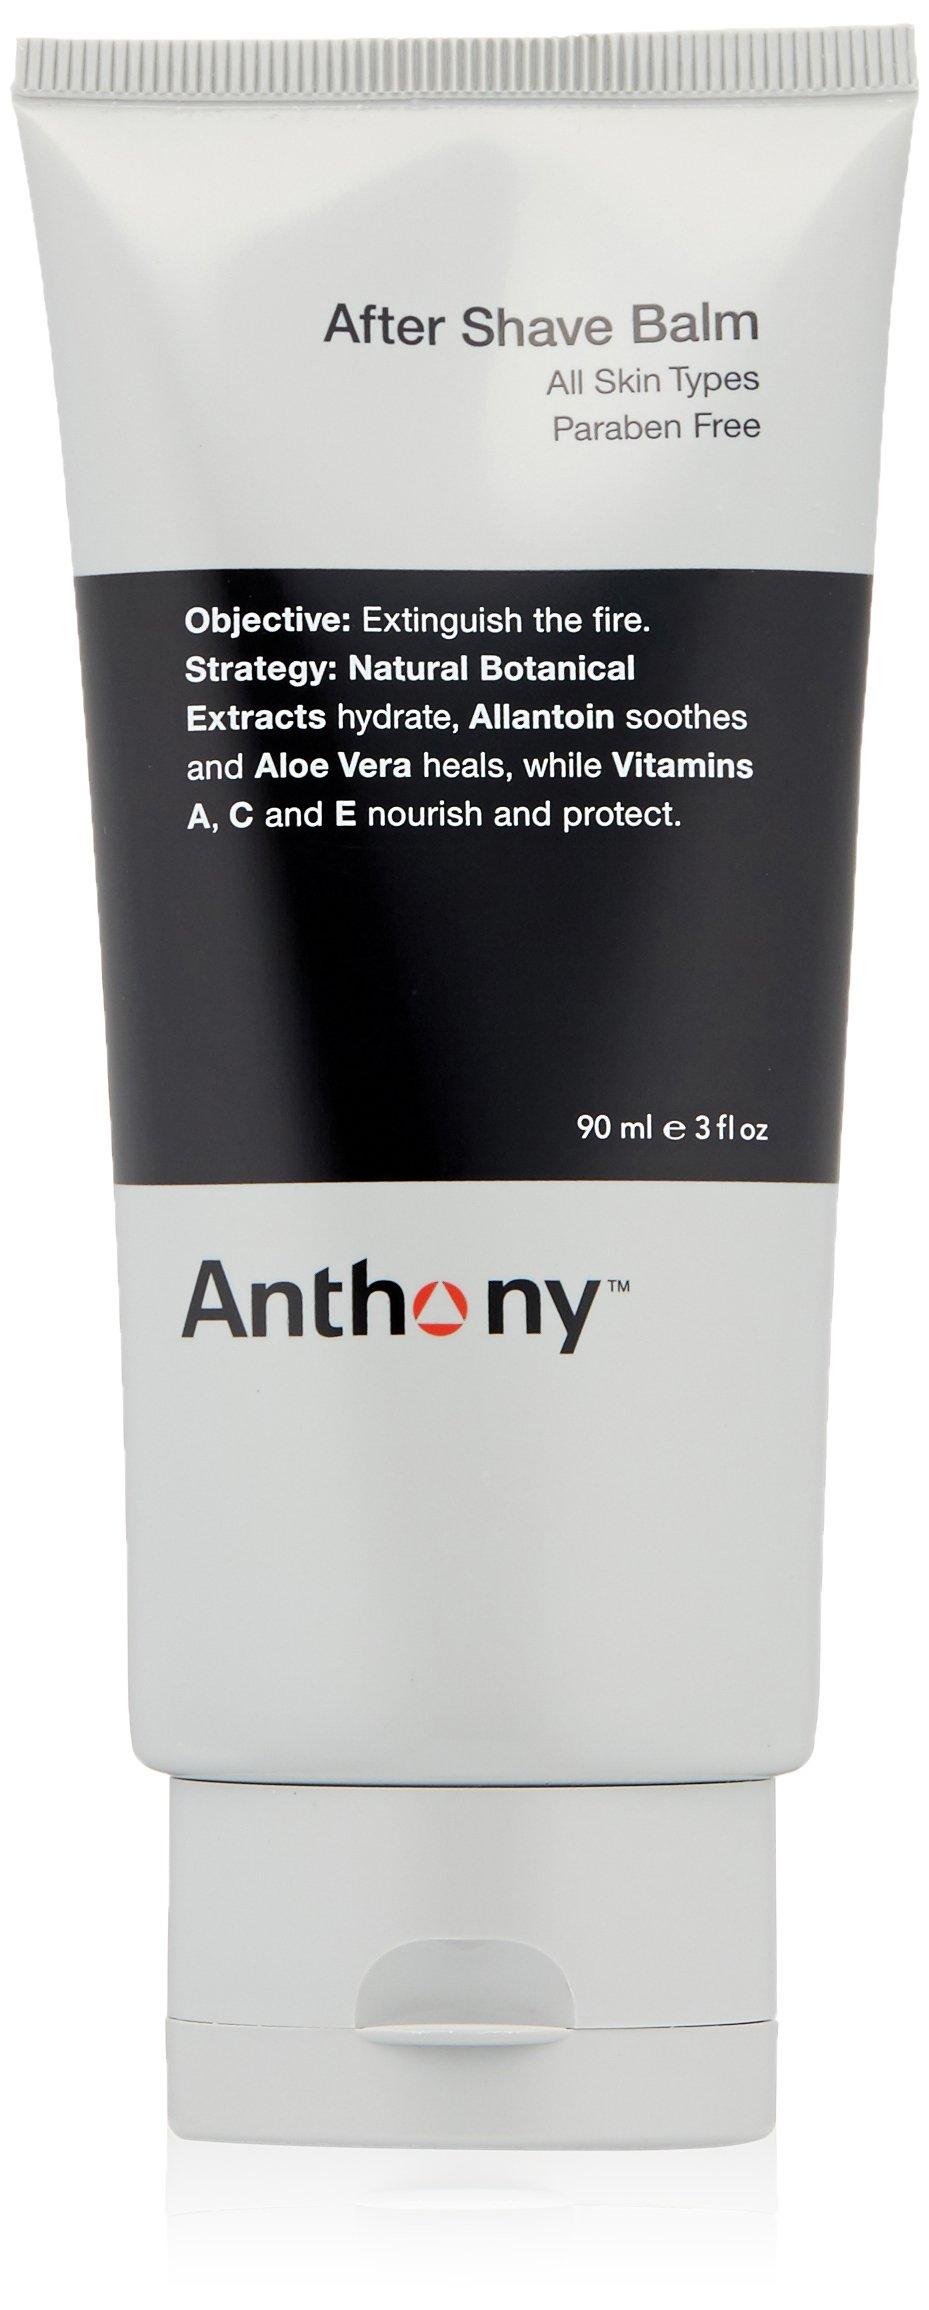 Anthony Aftershave Balm, 3 fl. oz.